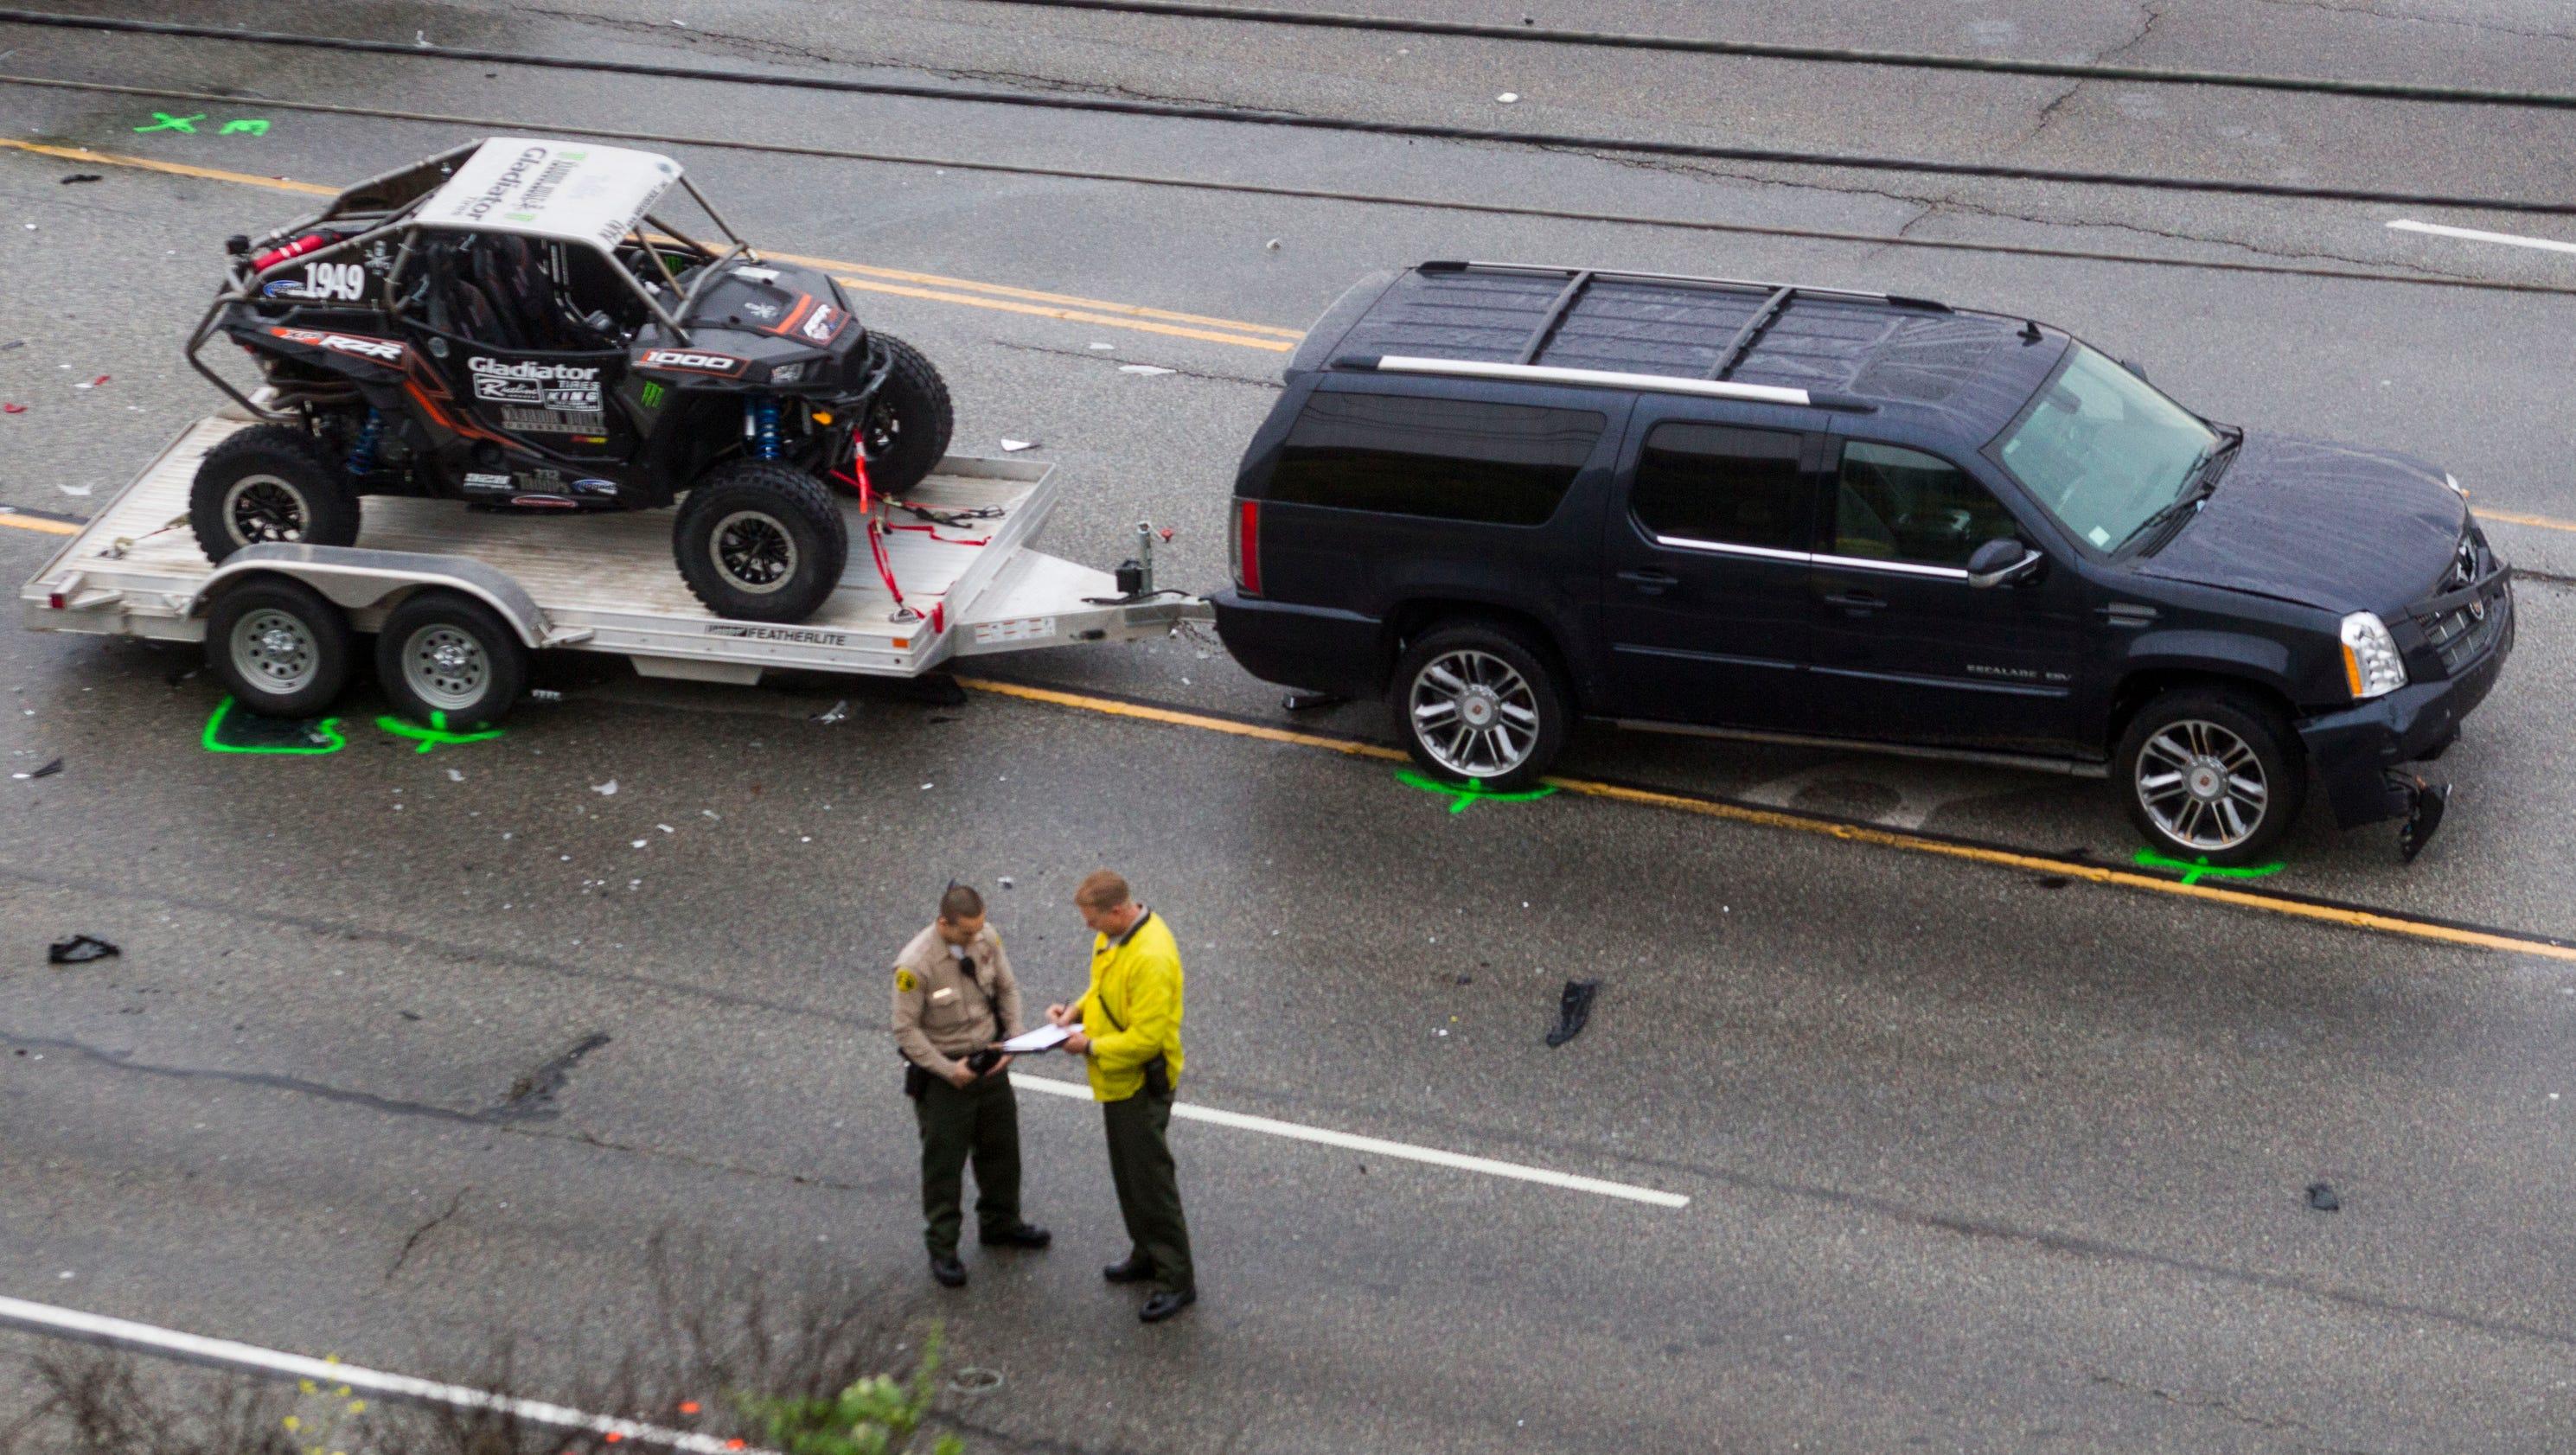 Latest Cadillac Escalade >> Escalade curse?: Bruce Jenner latest to find trouble